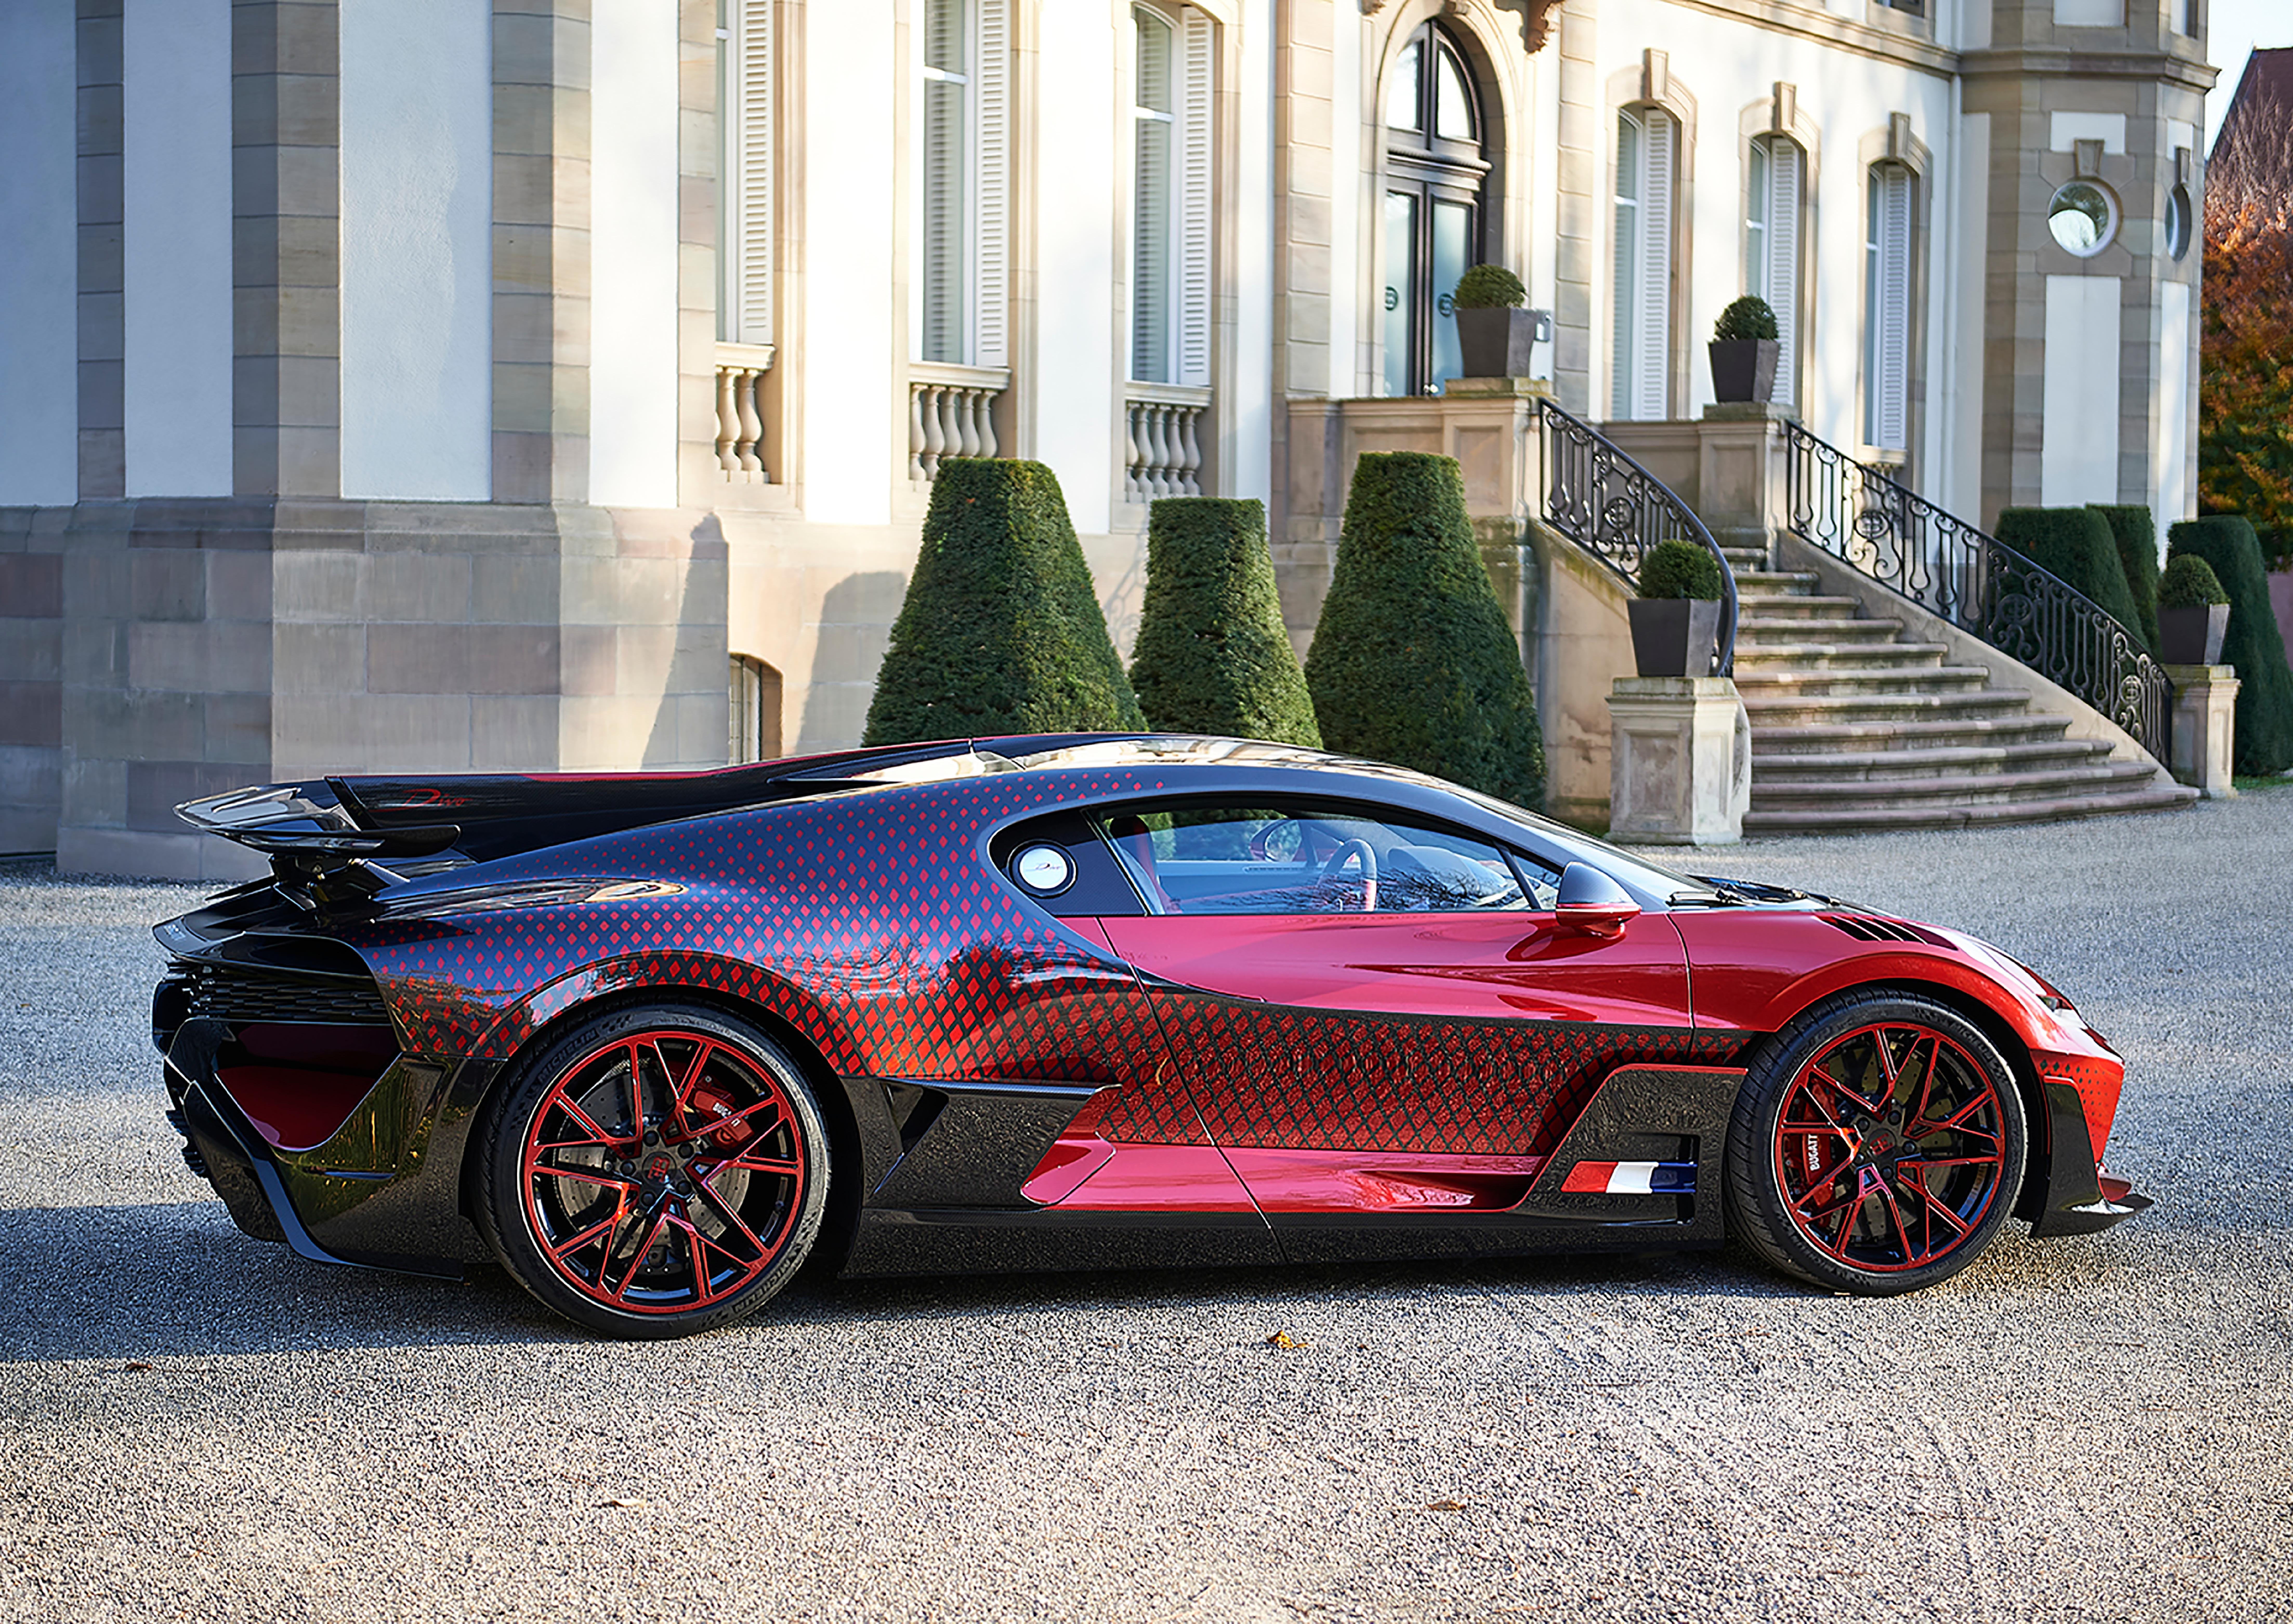 bugatti divo lady bug 2021 4k 1618920051 - Bugatti Divo Lady Bug 2021 4k - Bugatti Divo Lady Bug 2021 4k wallpapers